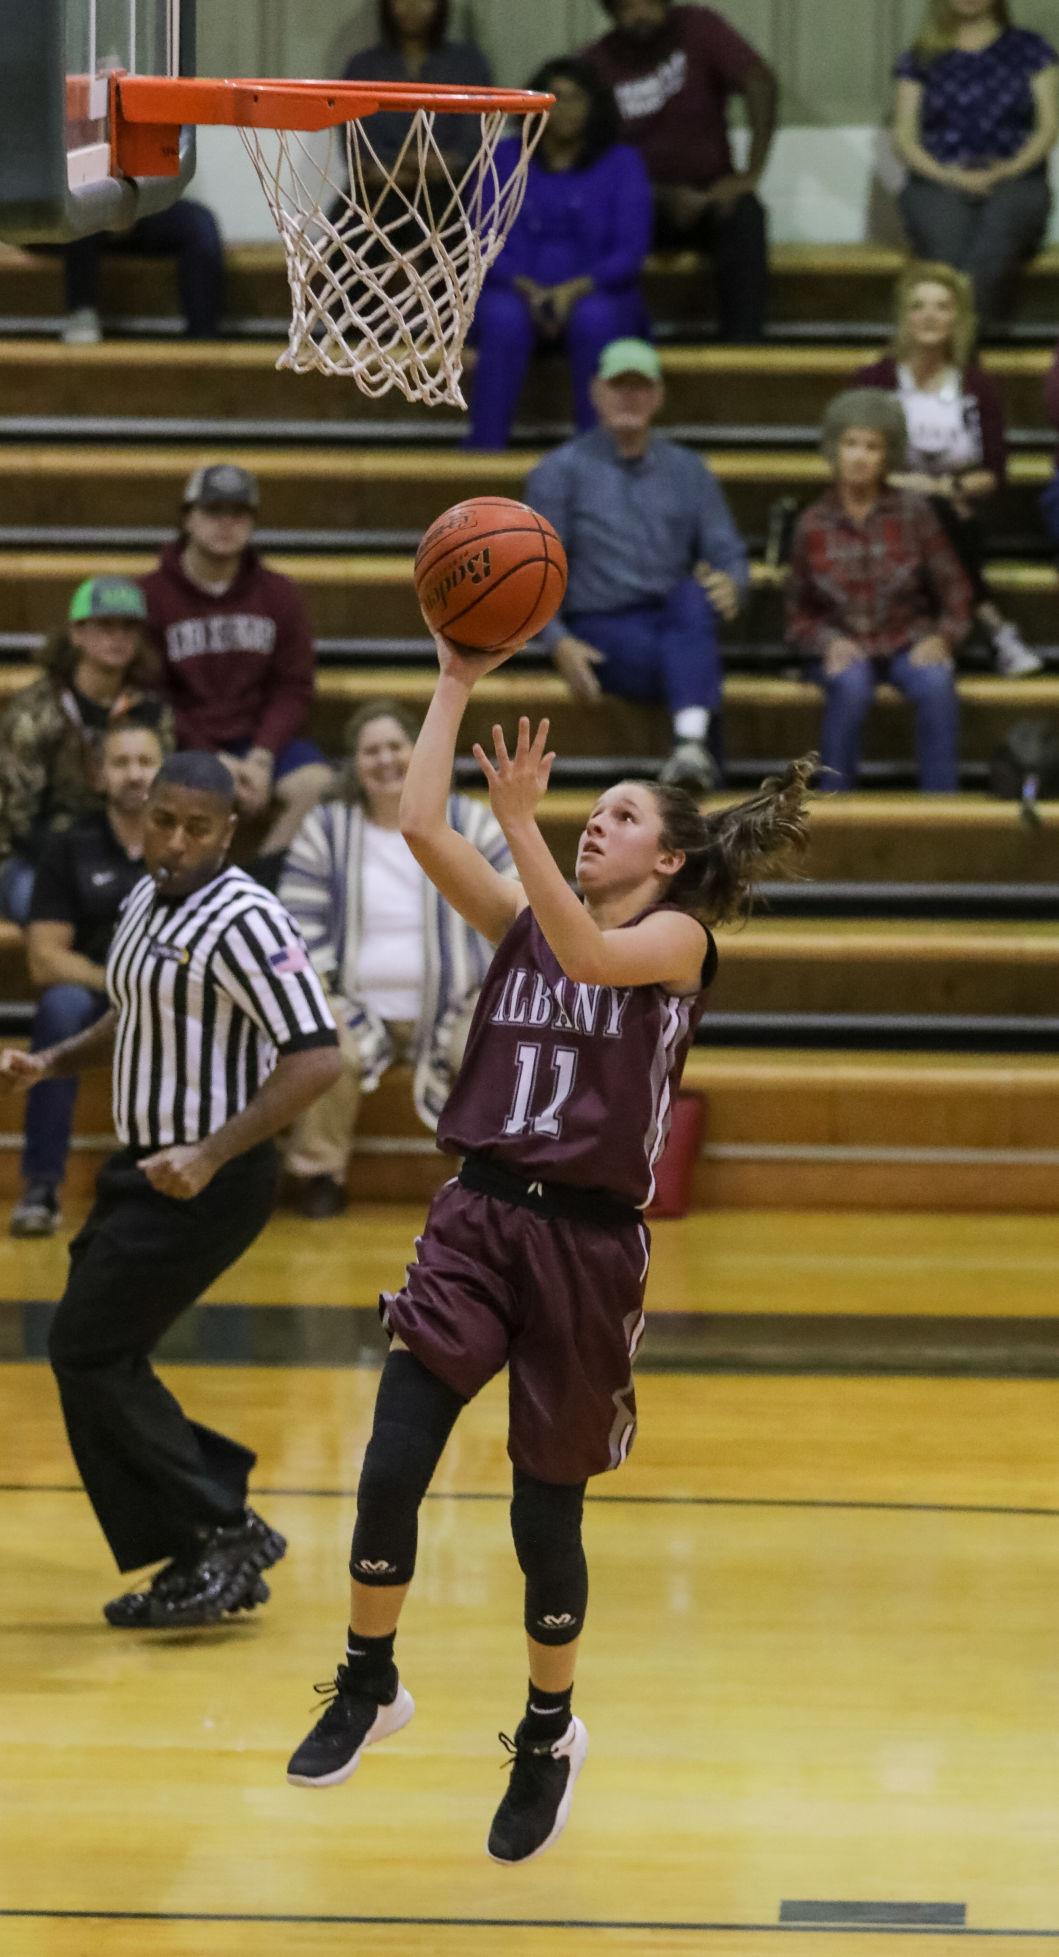 Walker Basketball Jamboree Haley Meyers